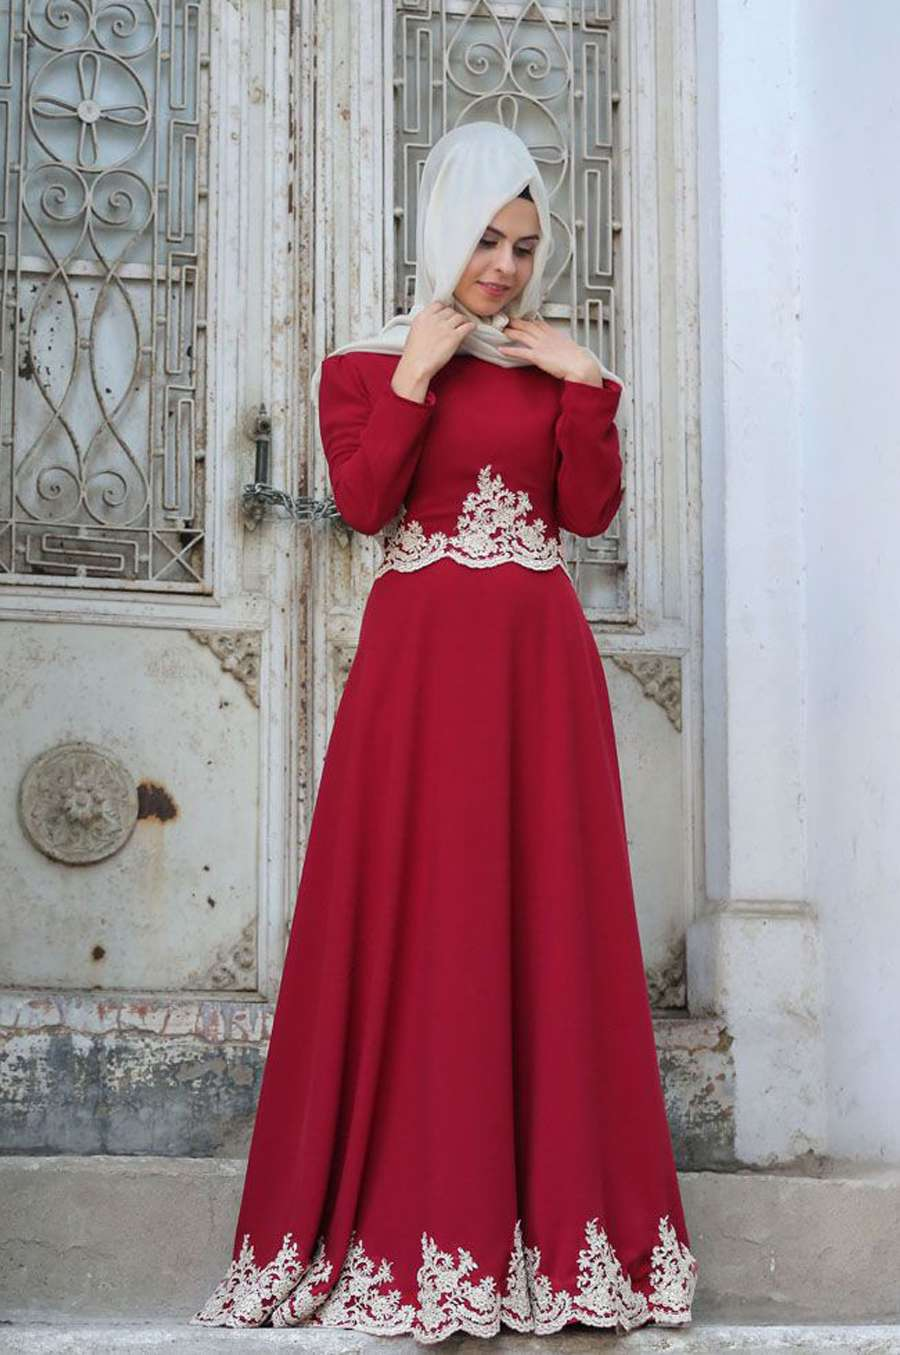 بالصور فستان سهرة , فساتين سواريهات للافراح 3500 2